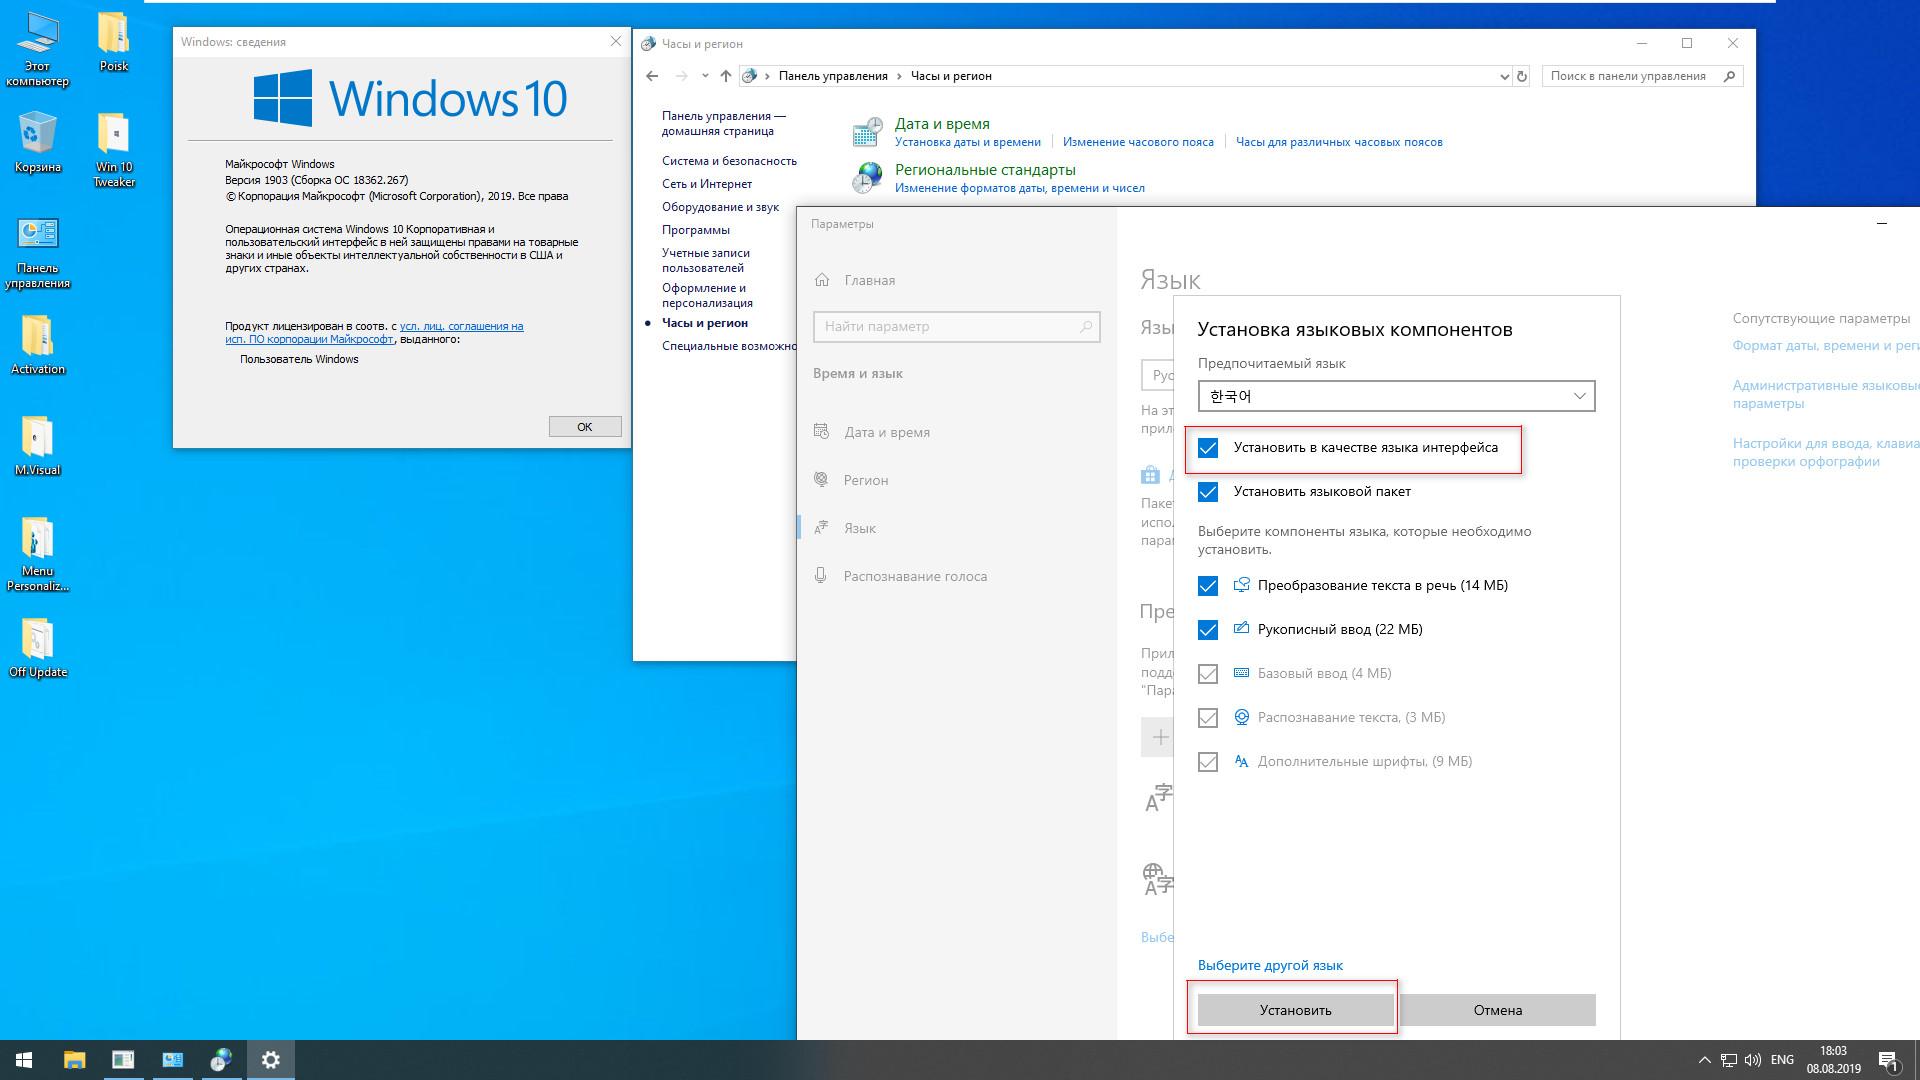 Windows 10 Enterprise x64 lite 1903 build 18362.267 by Zosma.iso - 러시아어 한글화 시도 - 그래서 그냥 원본대로 설치 후에 한글화 시도 2019-08-09_000347.jpg